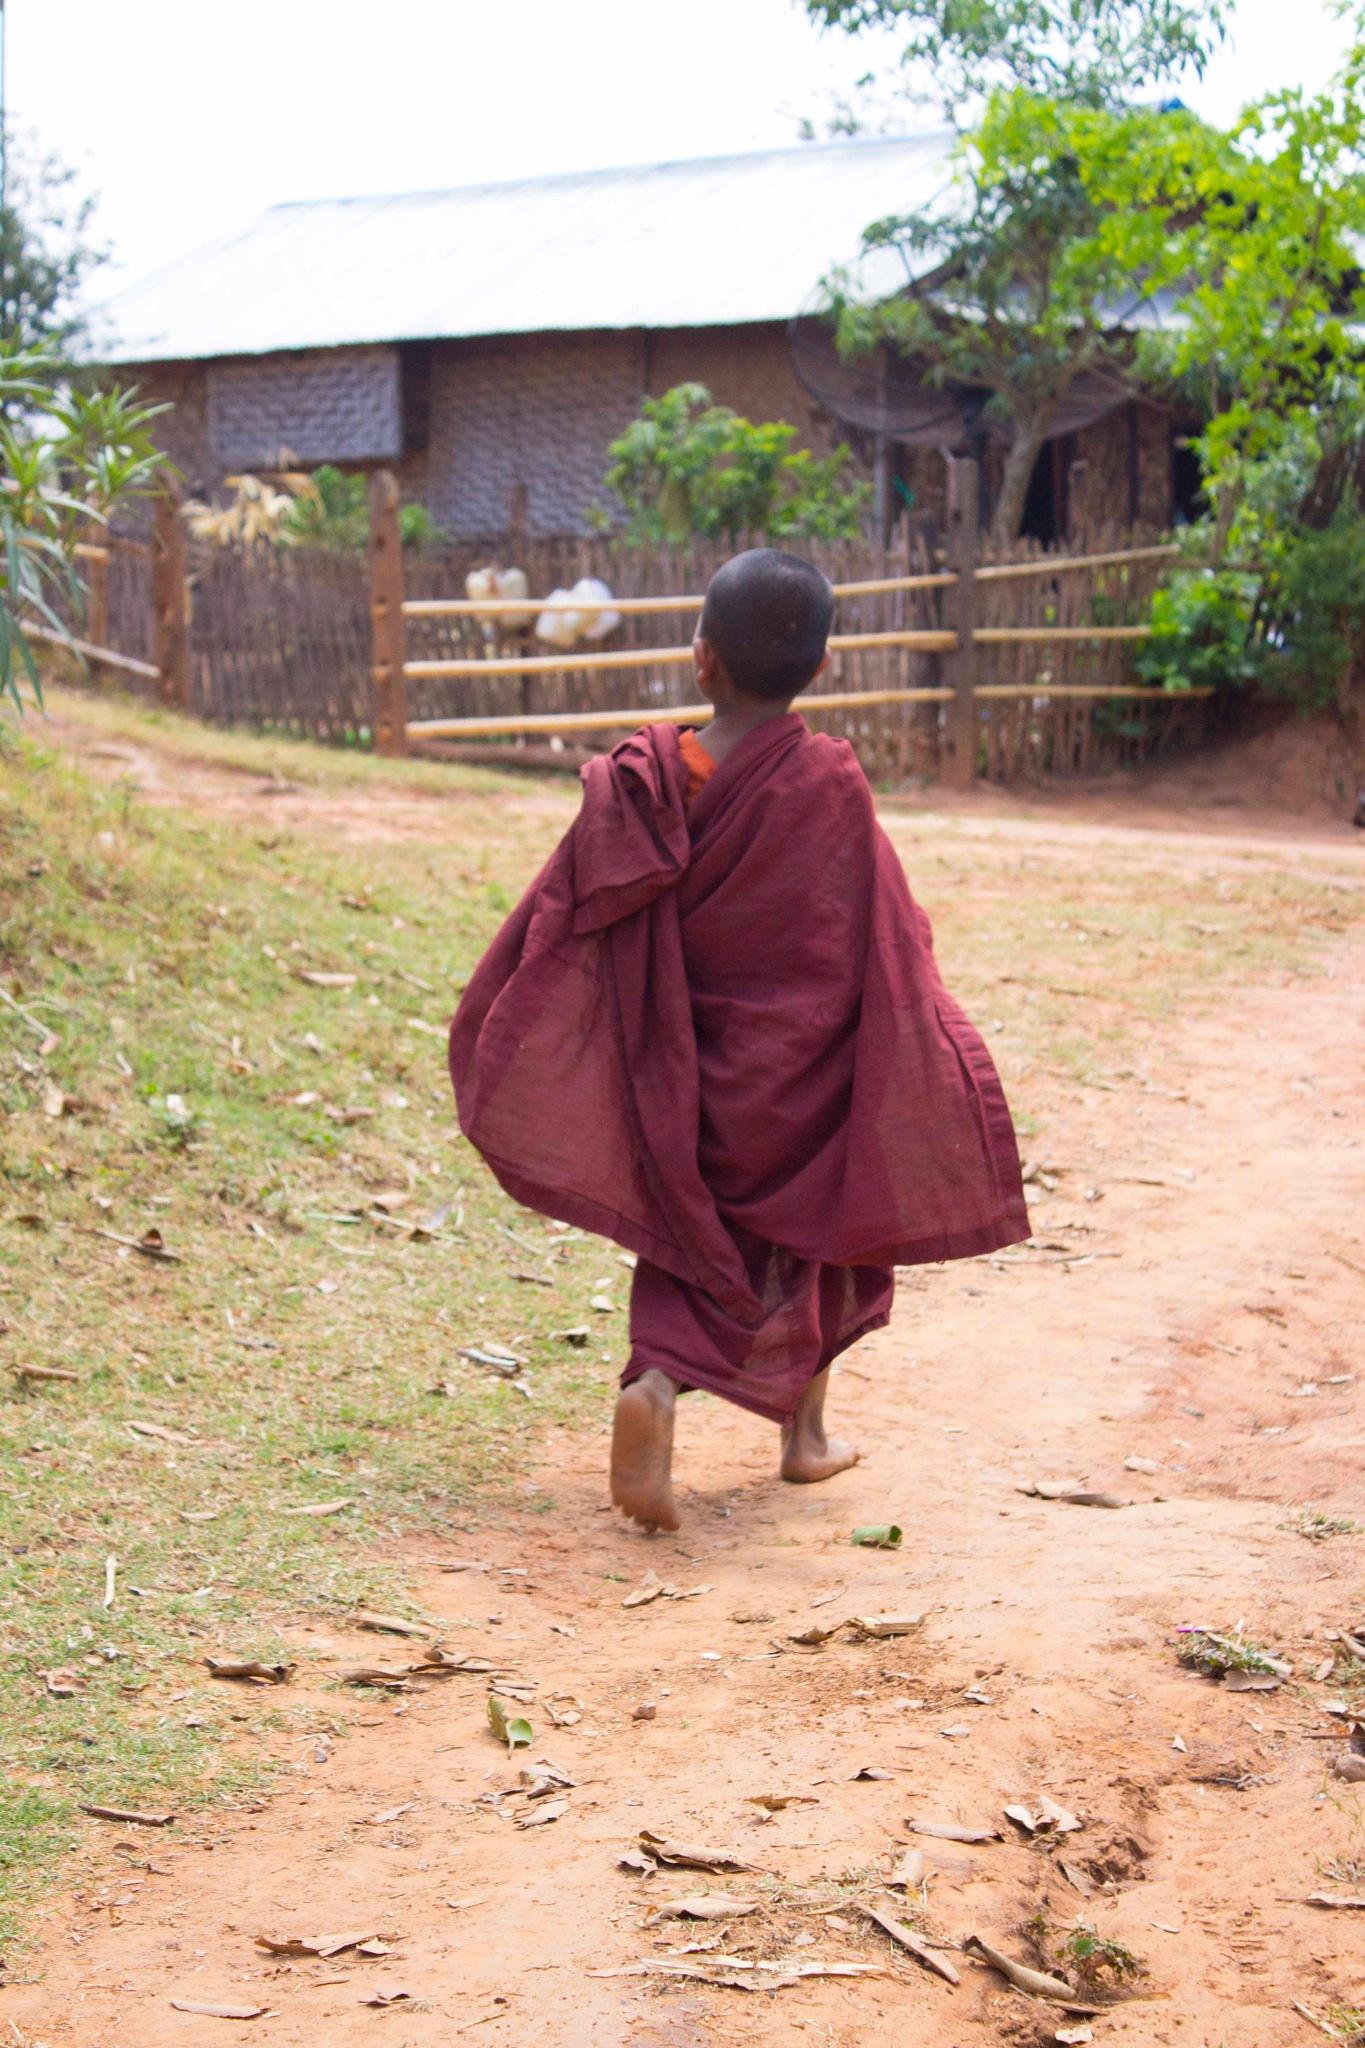 Child monk by Malin Wagland